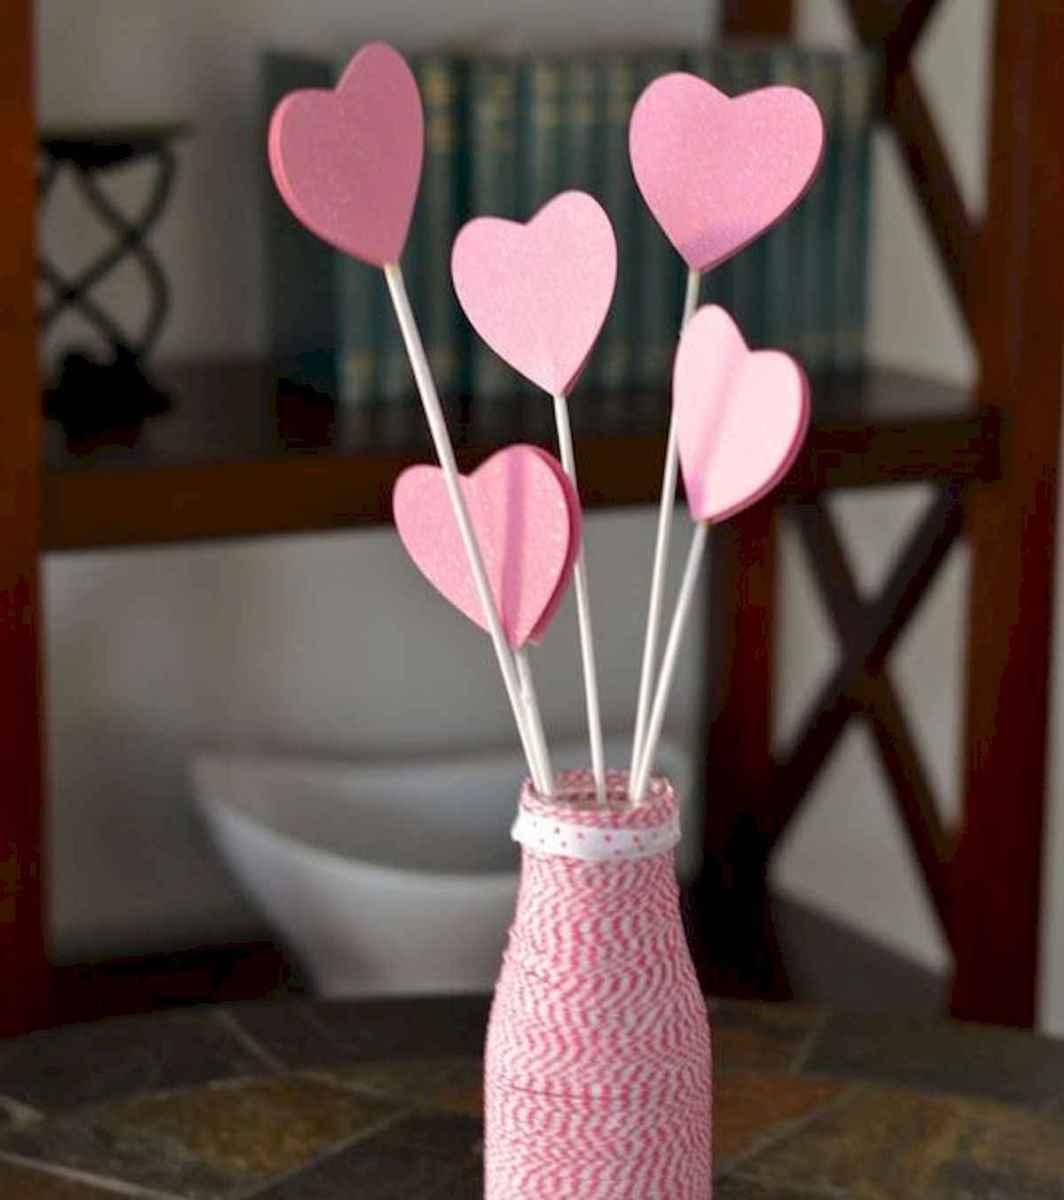 75 lovely valentines day crafts design ideas (5)